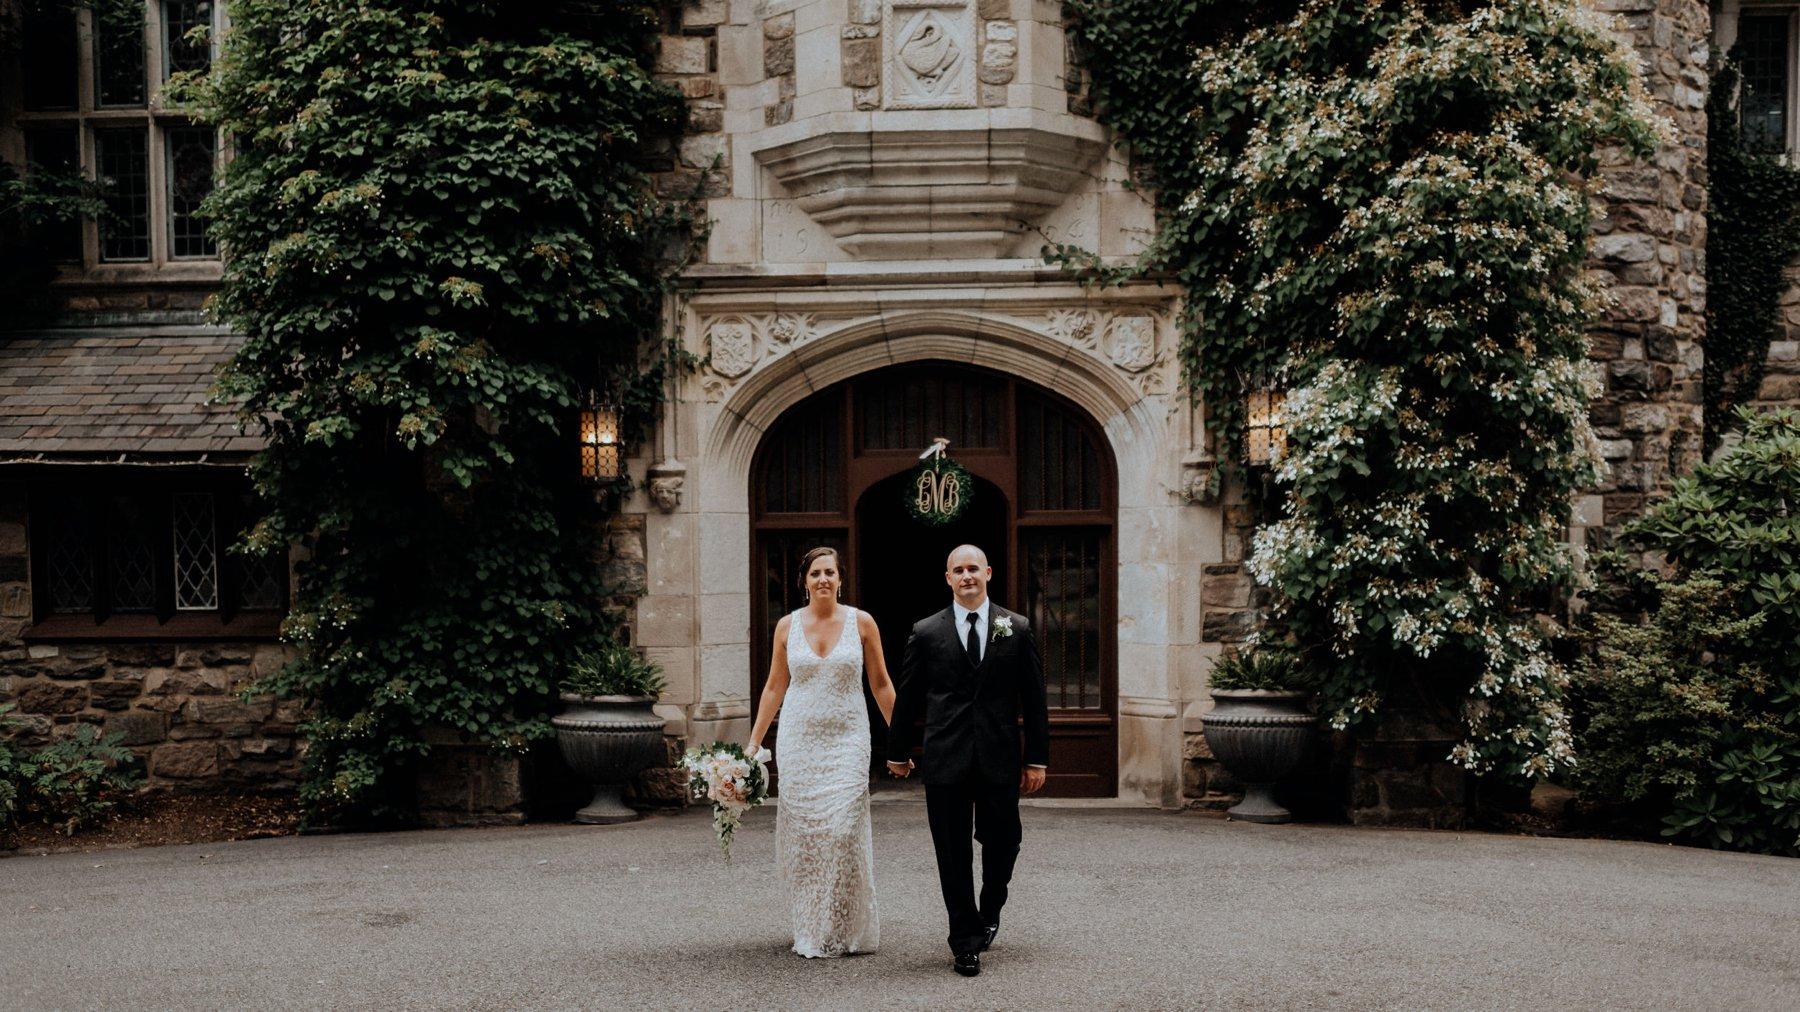 212-207-new-jersey-wedding-photographer-6.jpg